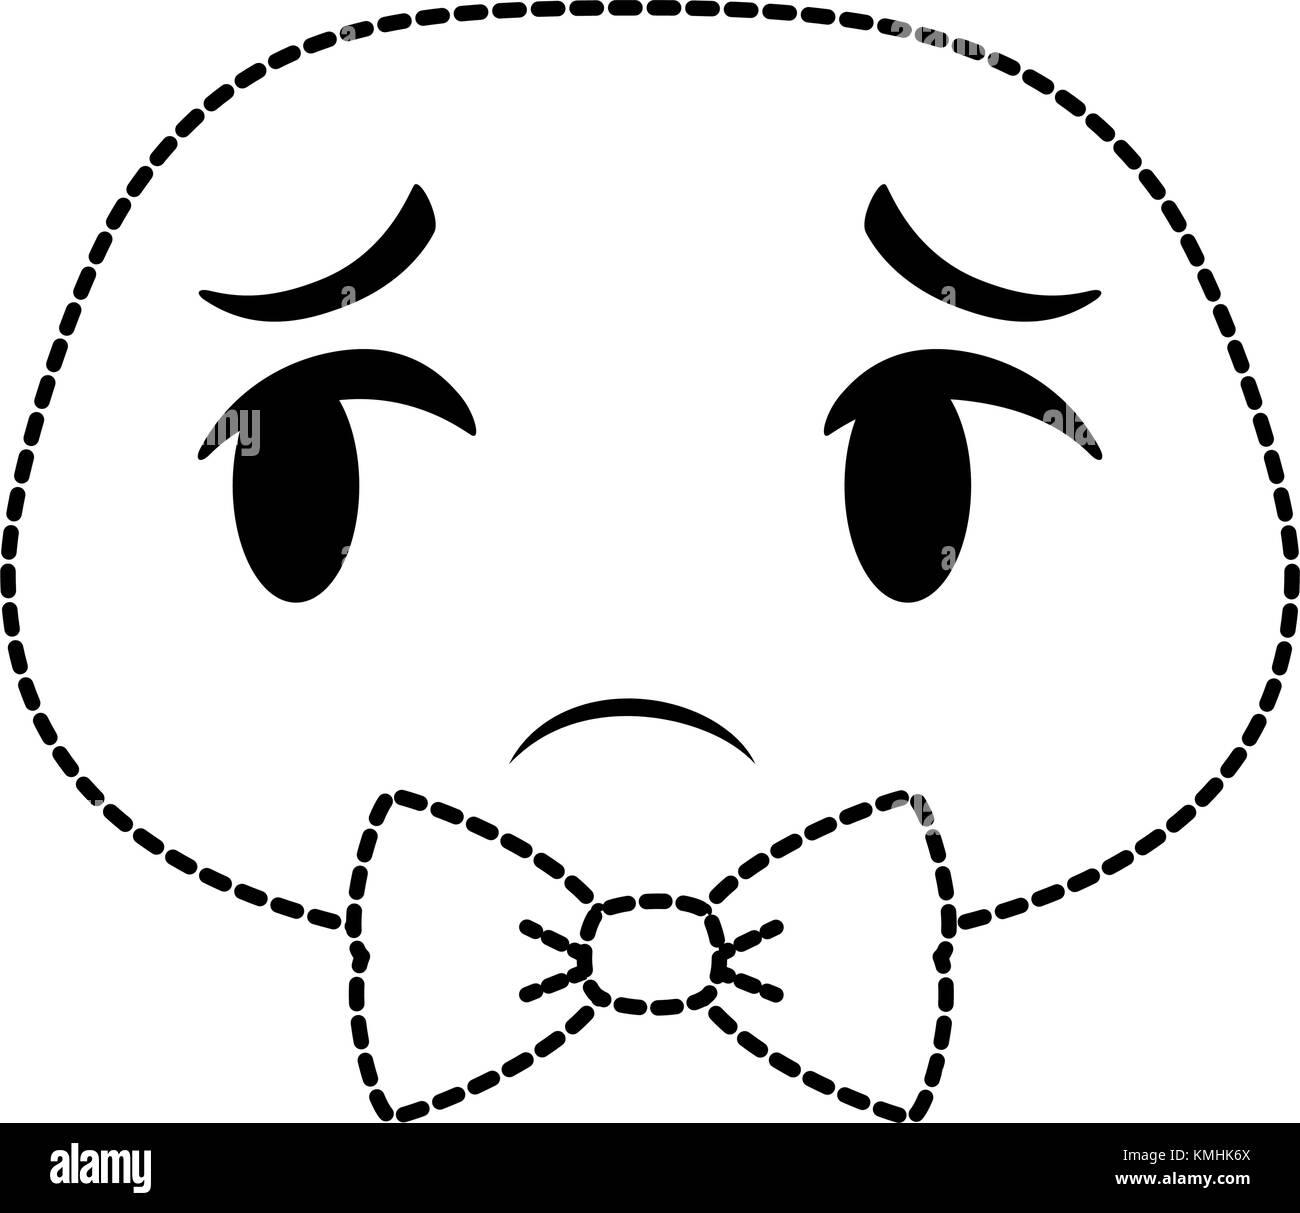 sad emoji face icon - Stock Image